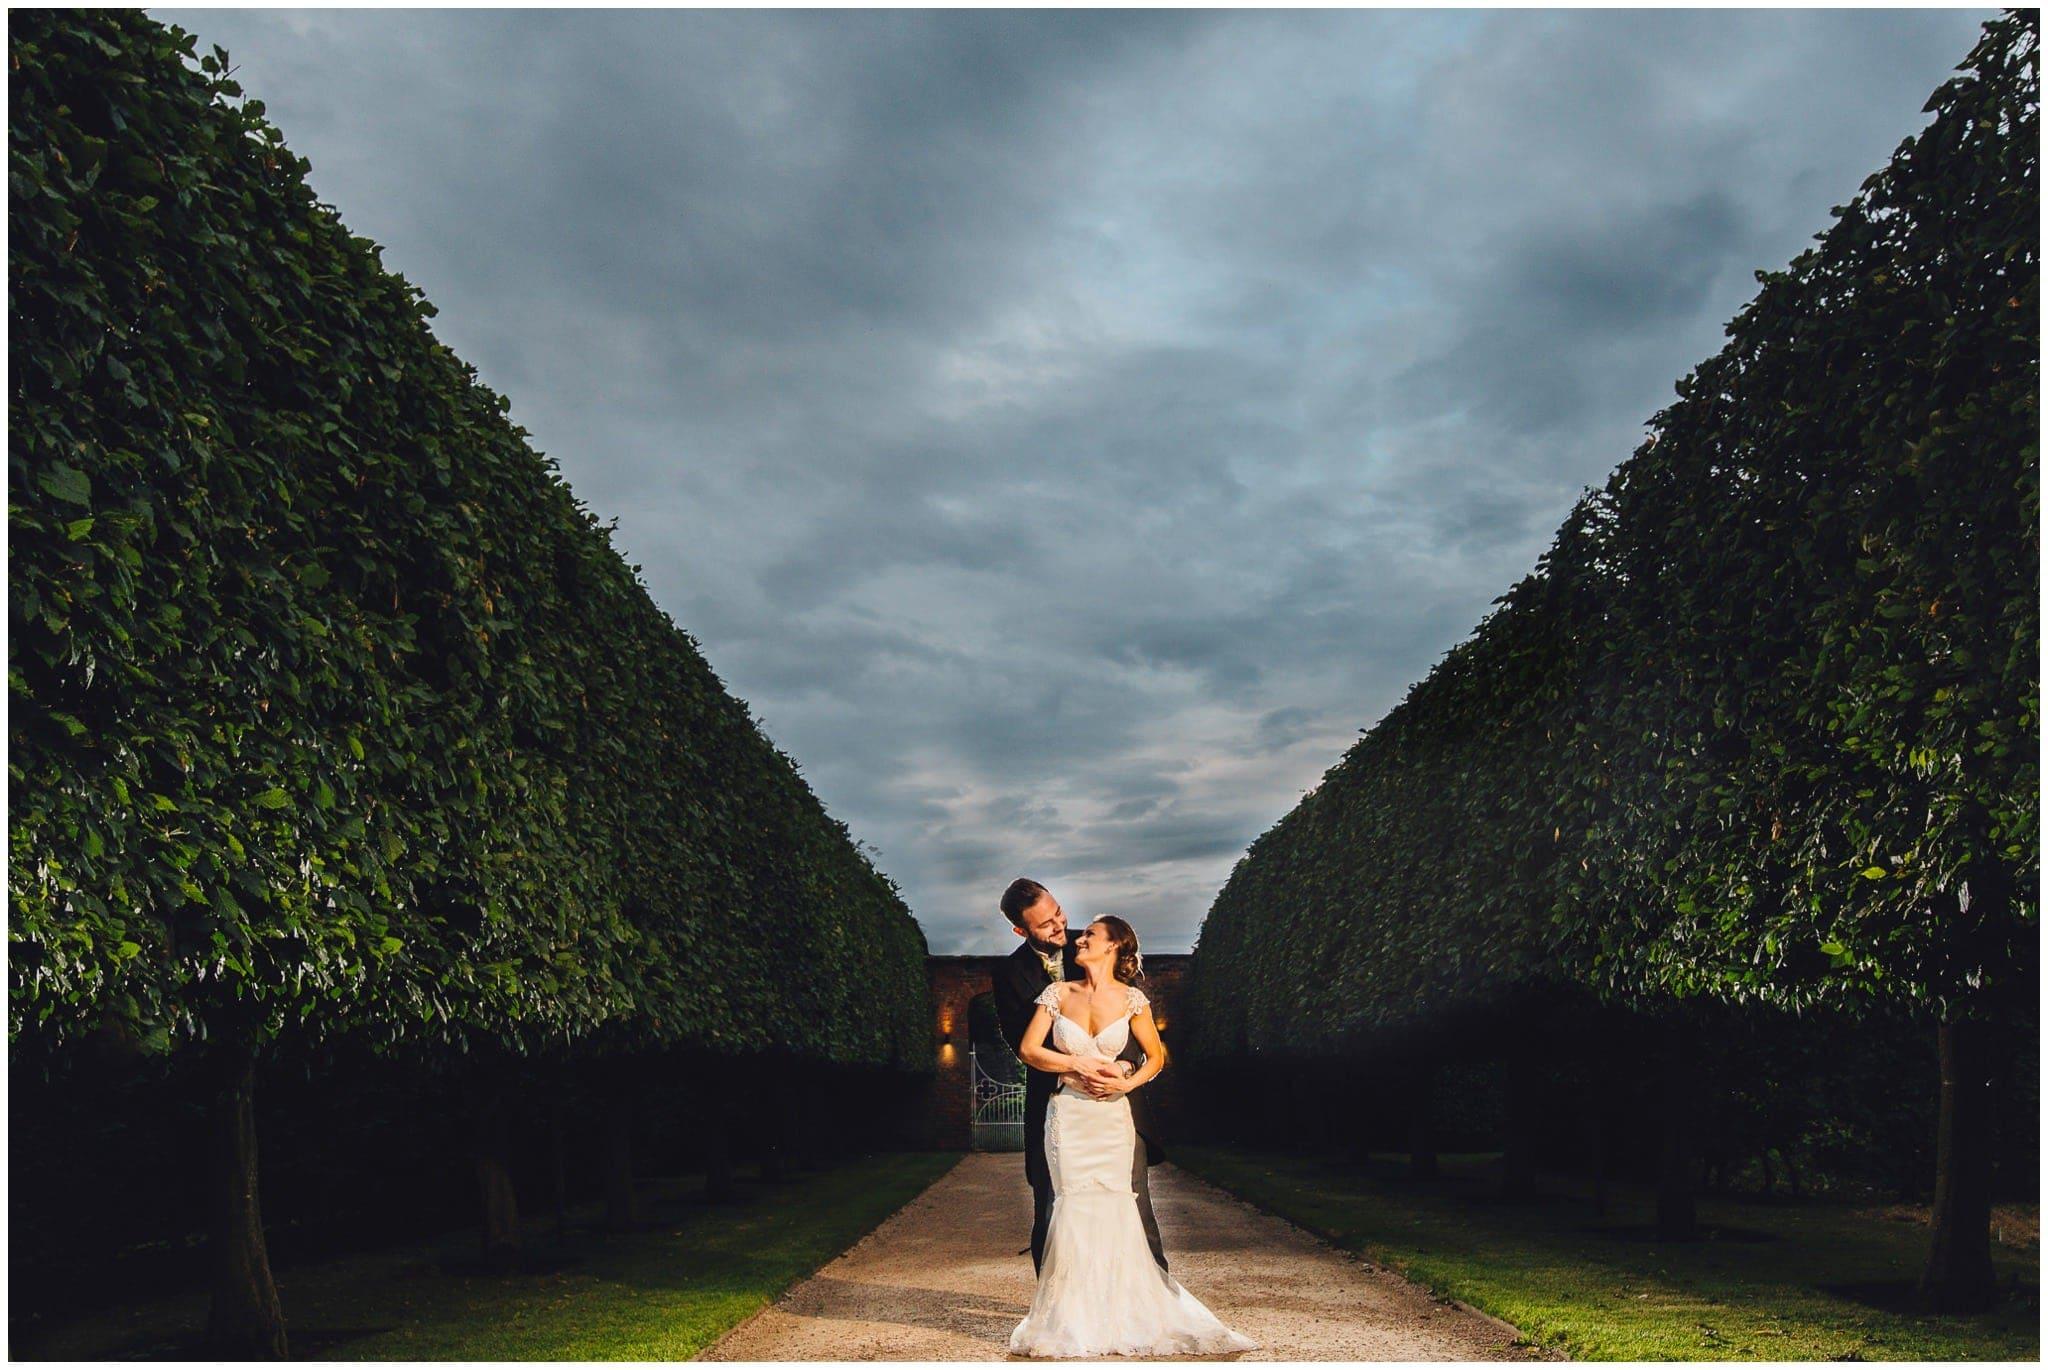 combermere-abbey-wedding-photographer-112